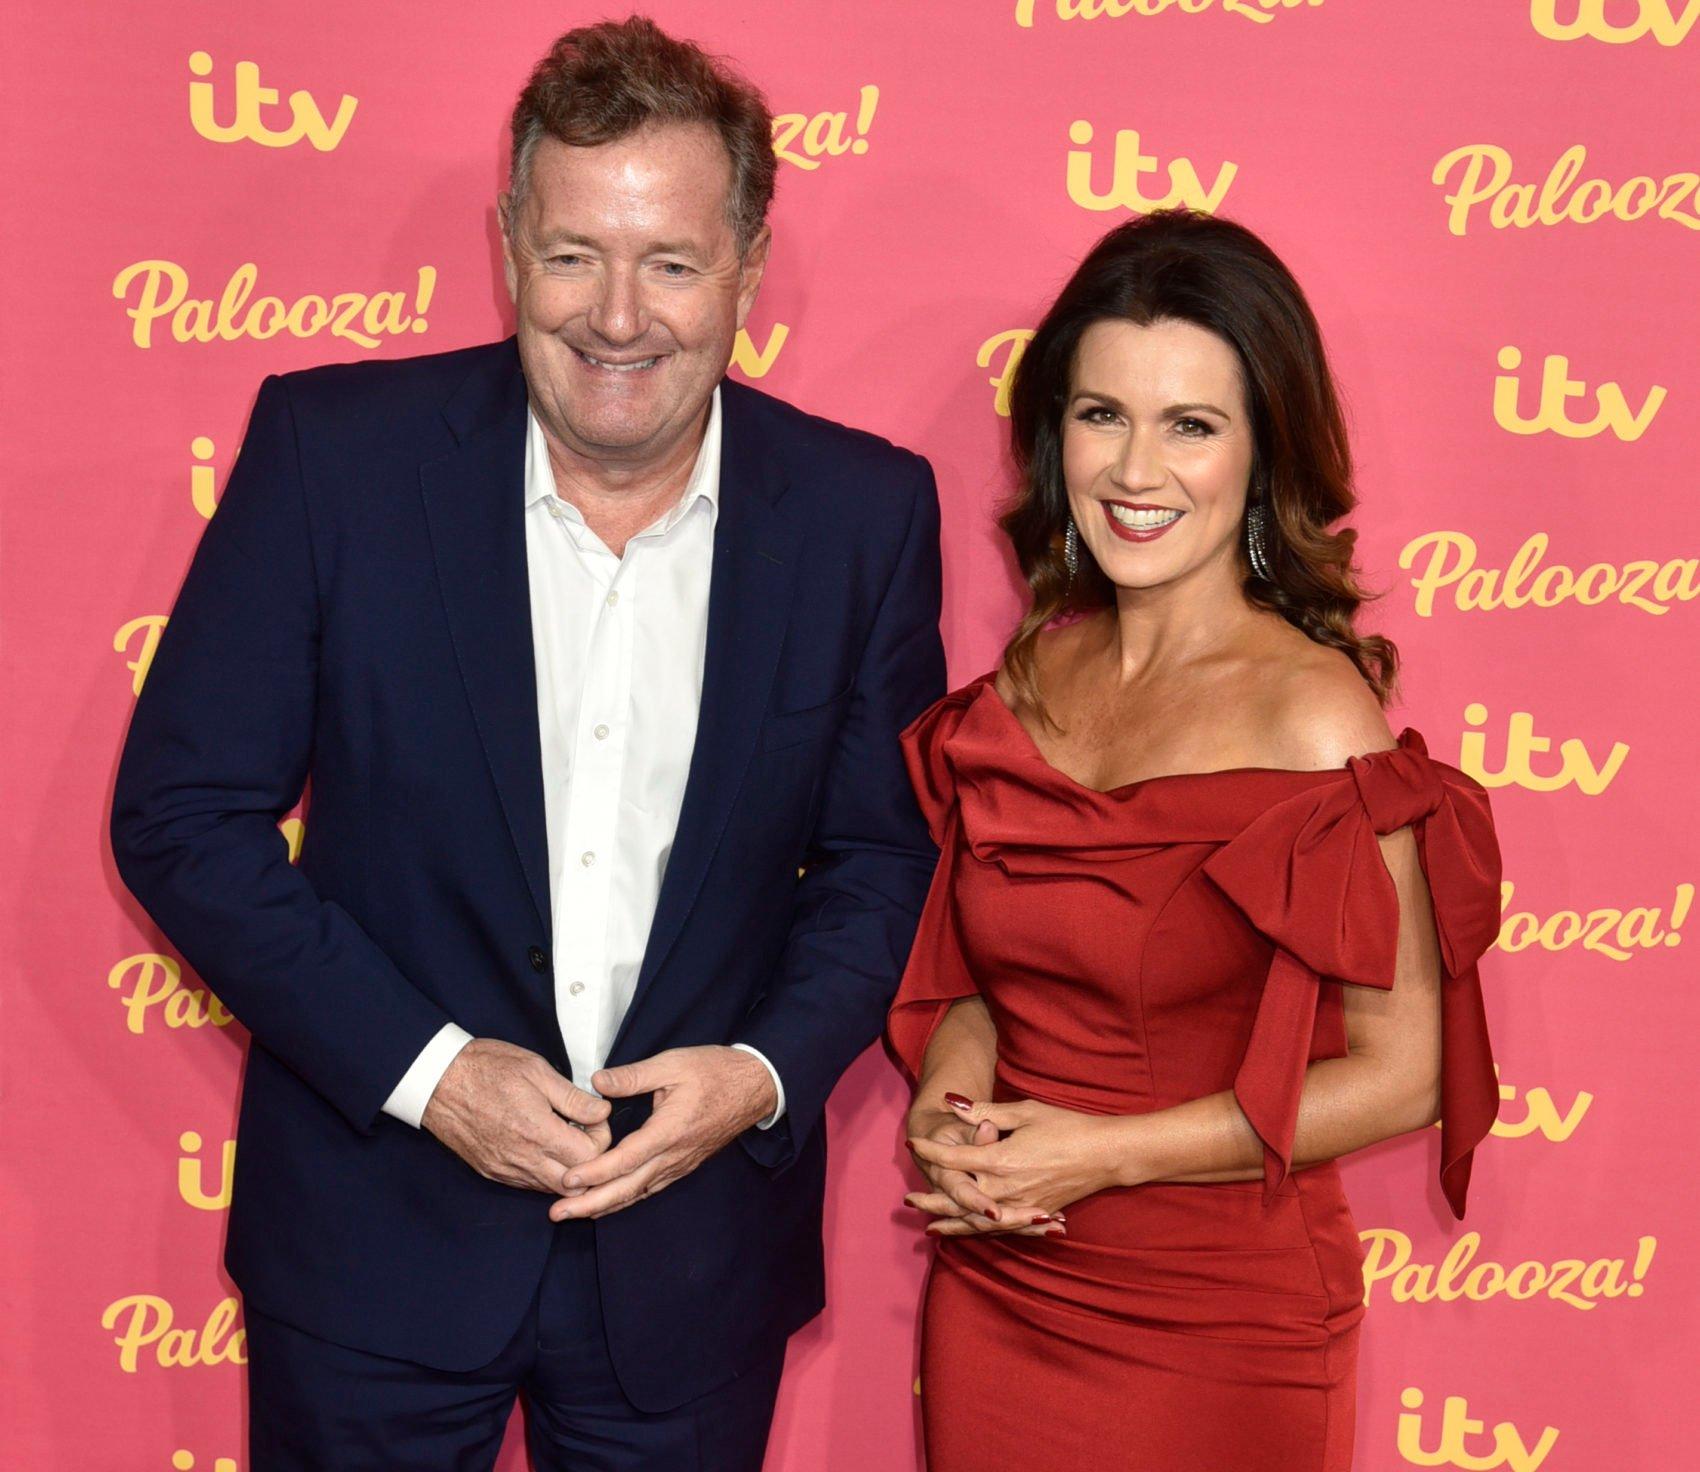 Piers Morgan with GMB co-host Susanna Reid